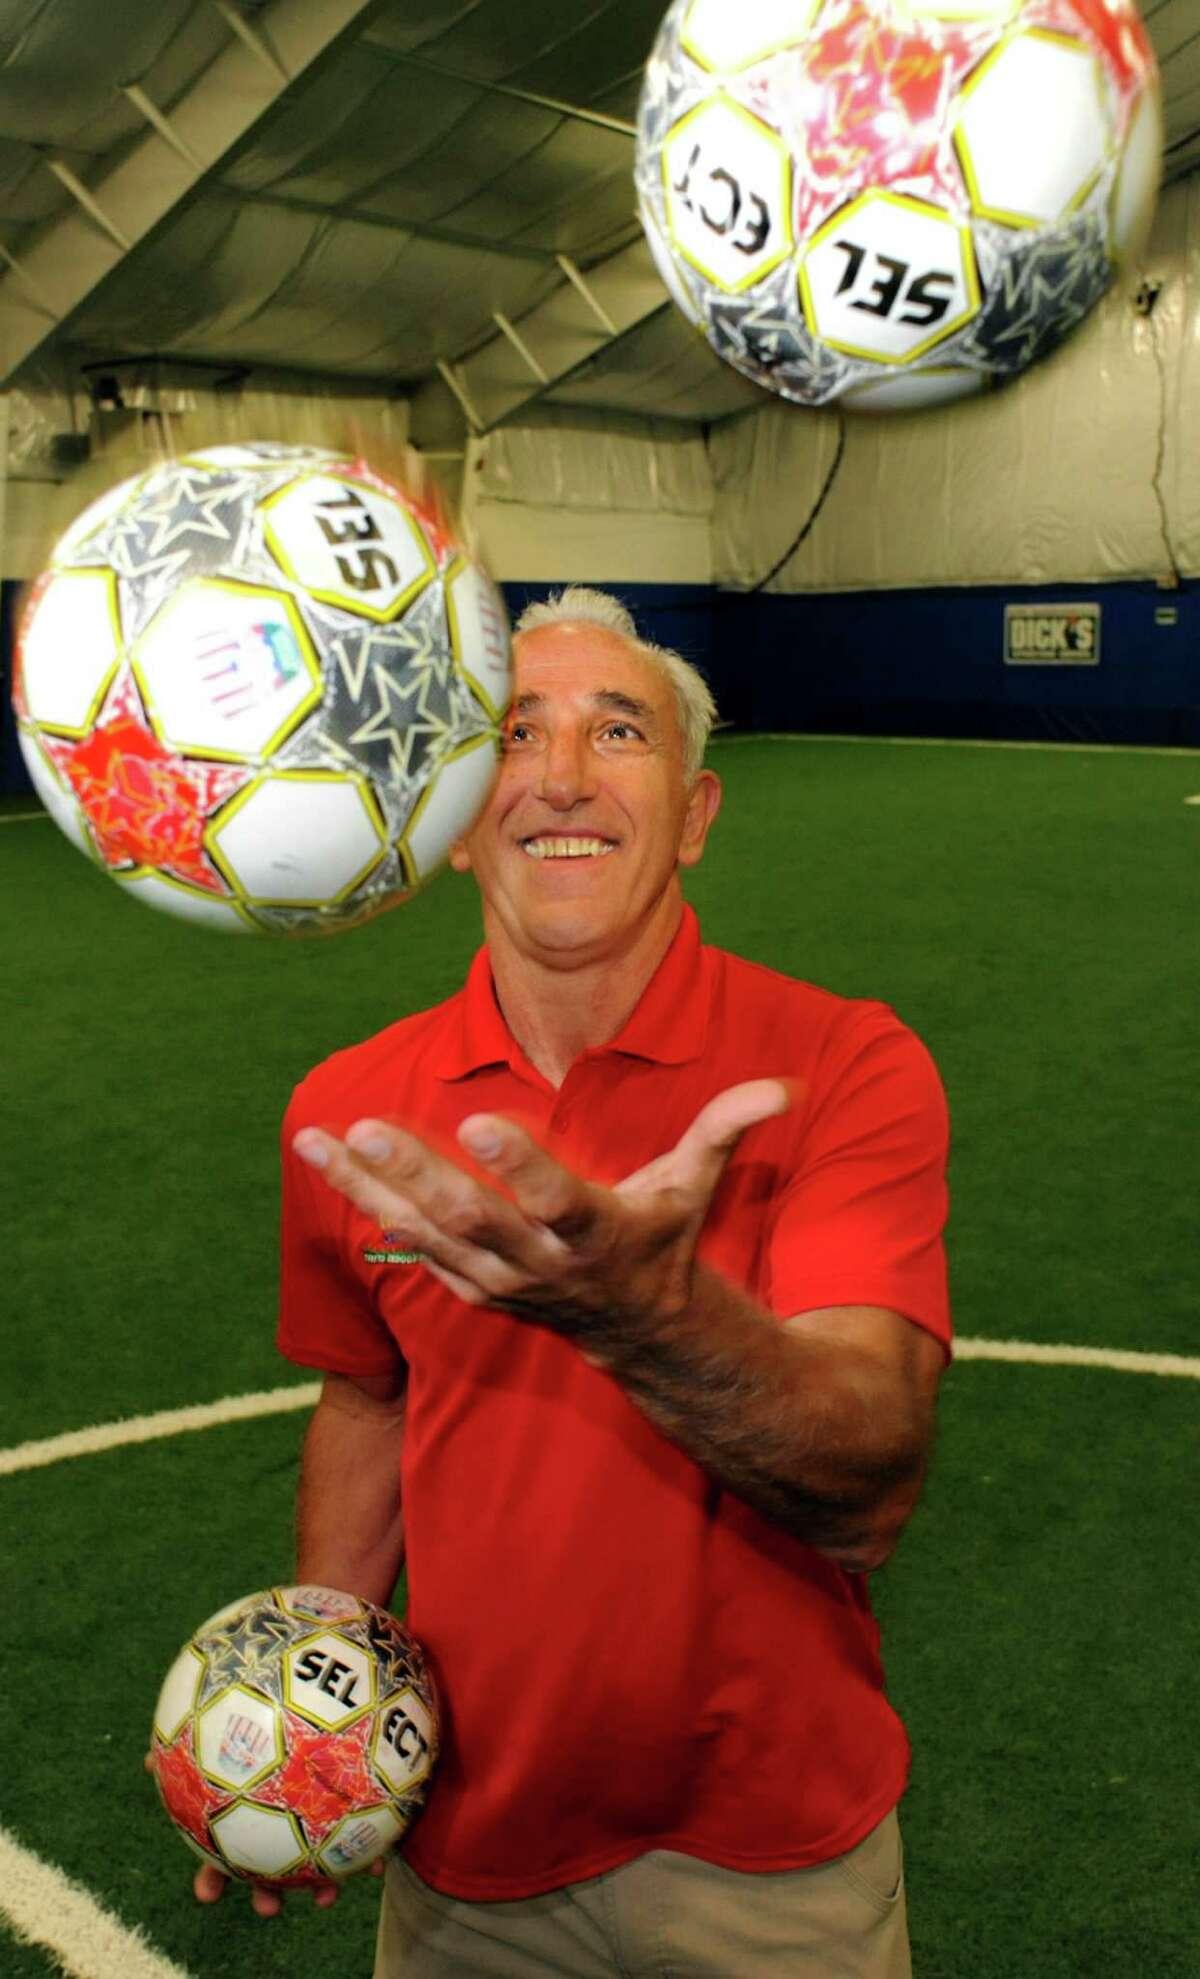 Afrim Nezaj juggles soccer balls on Thursday, Sept. 26, 2013, at Afrim's Sports in Colonie, N.Y. (Cindy Schultz / Times Union)